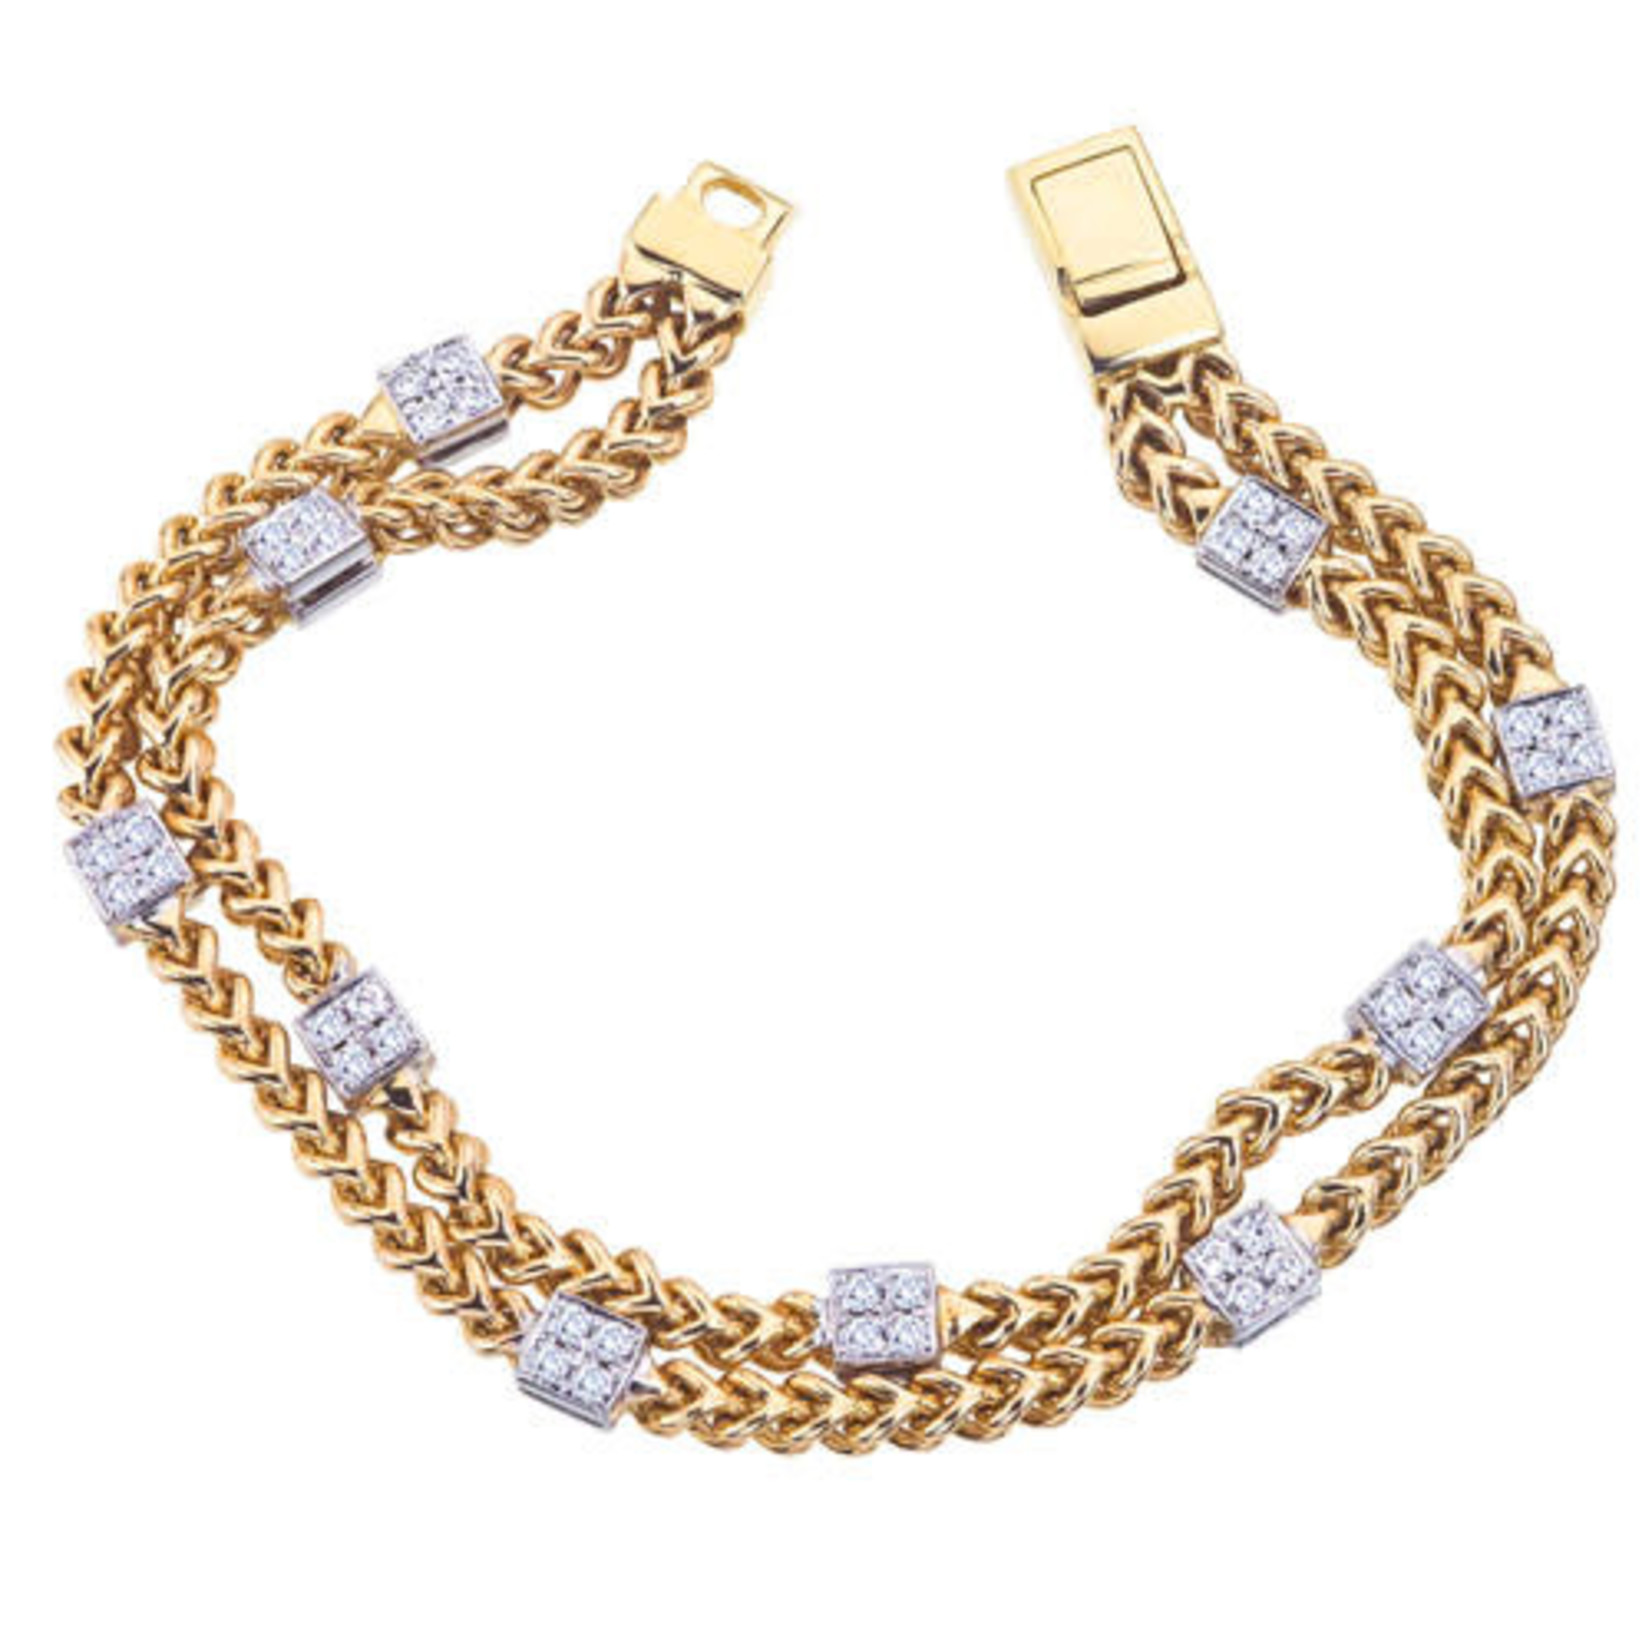 14K Yellow & White Gold Square Diamond Cluster 1.01ctw Bracelet